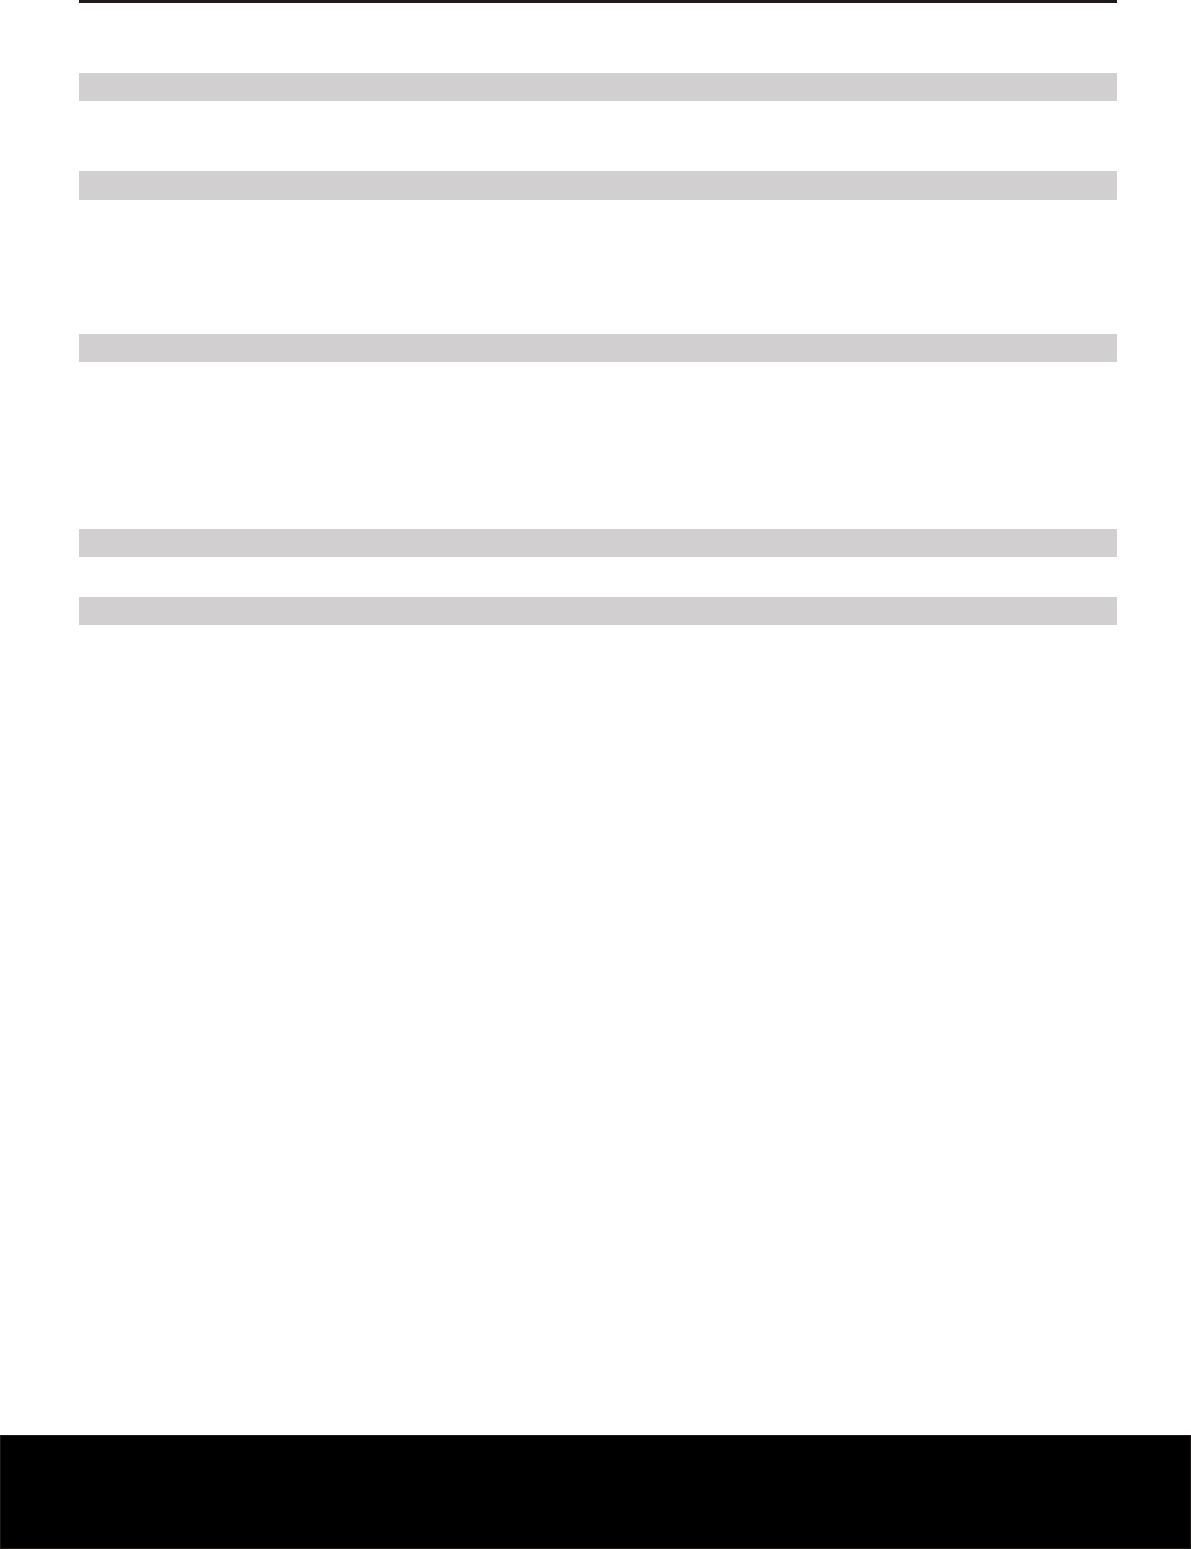 Handleiding Hifonics Txi3400 Pagina 15 Van 24 Deutsch English Wiring Diagram Installation